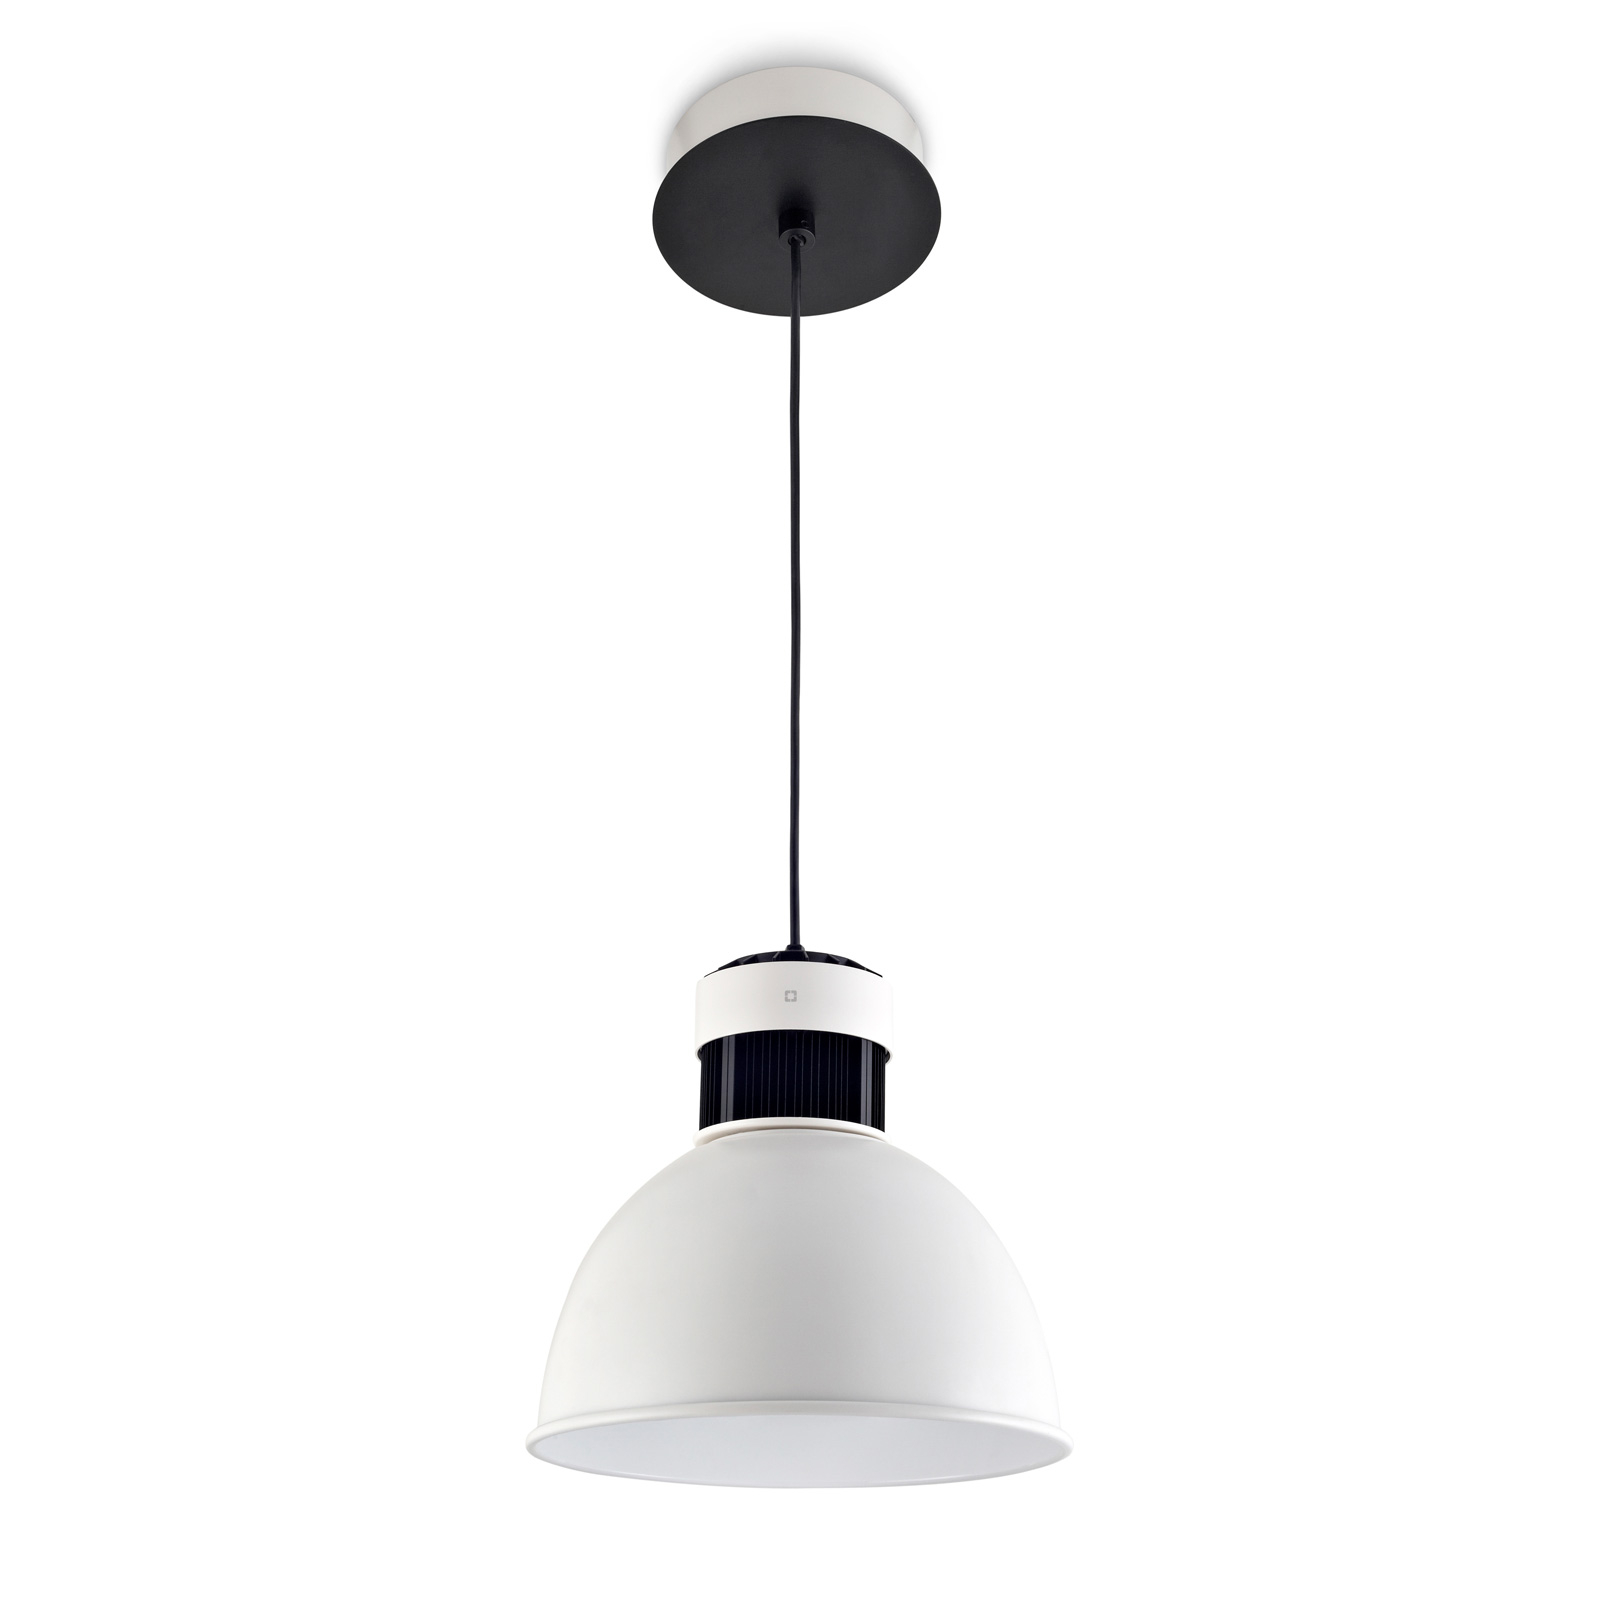 LEDS-C4 Pek suspension LED